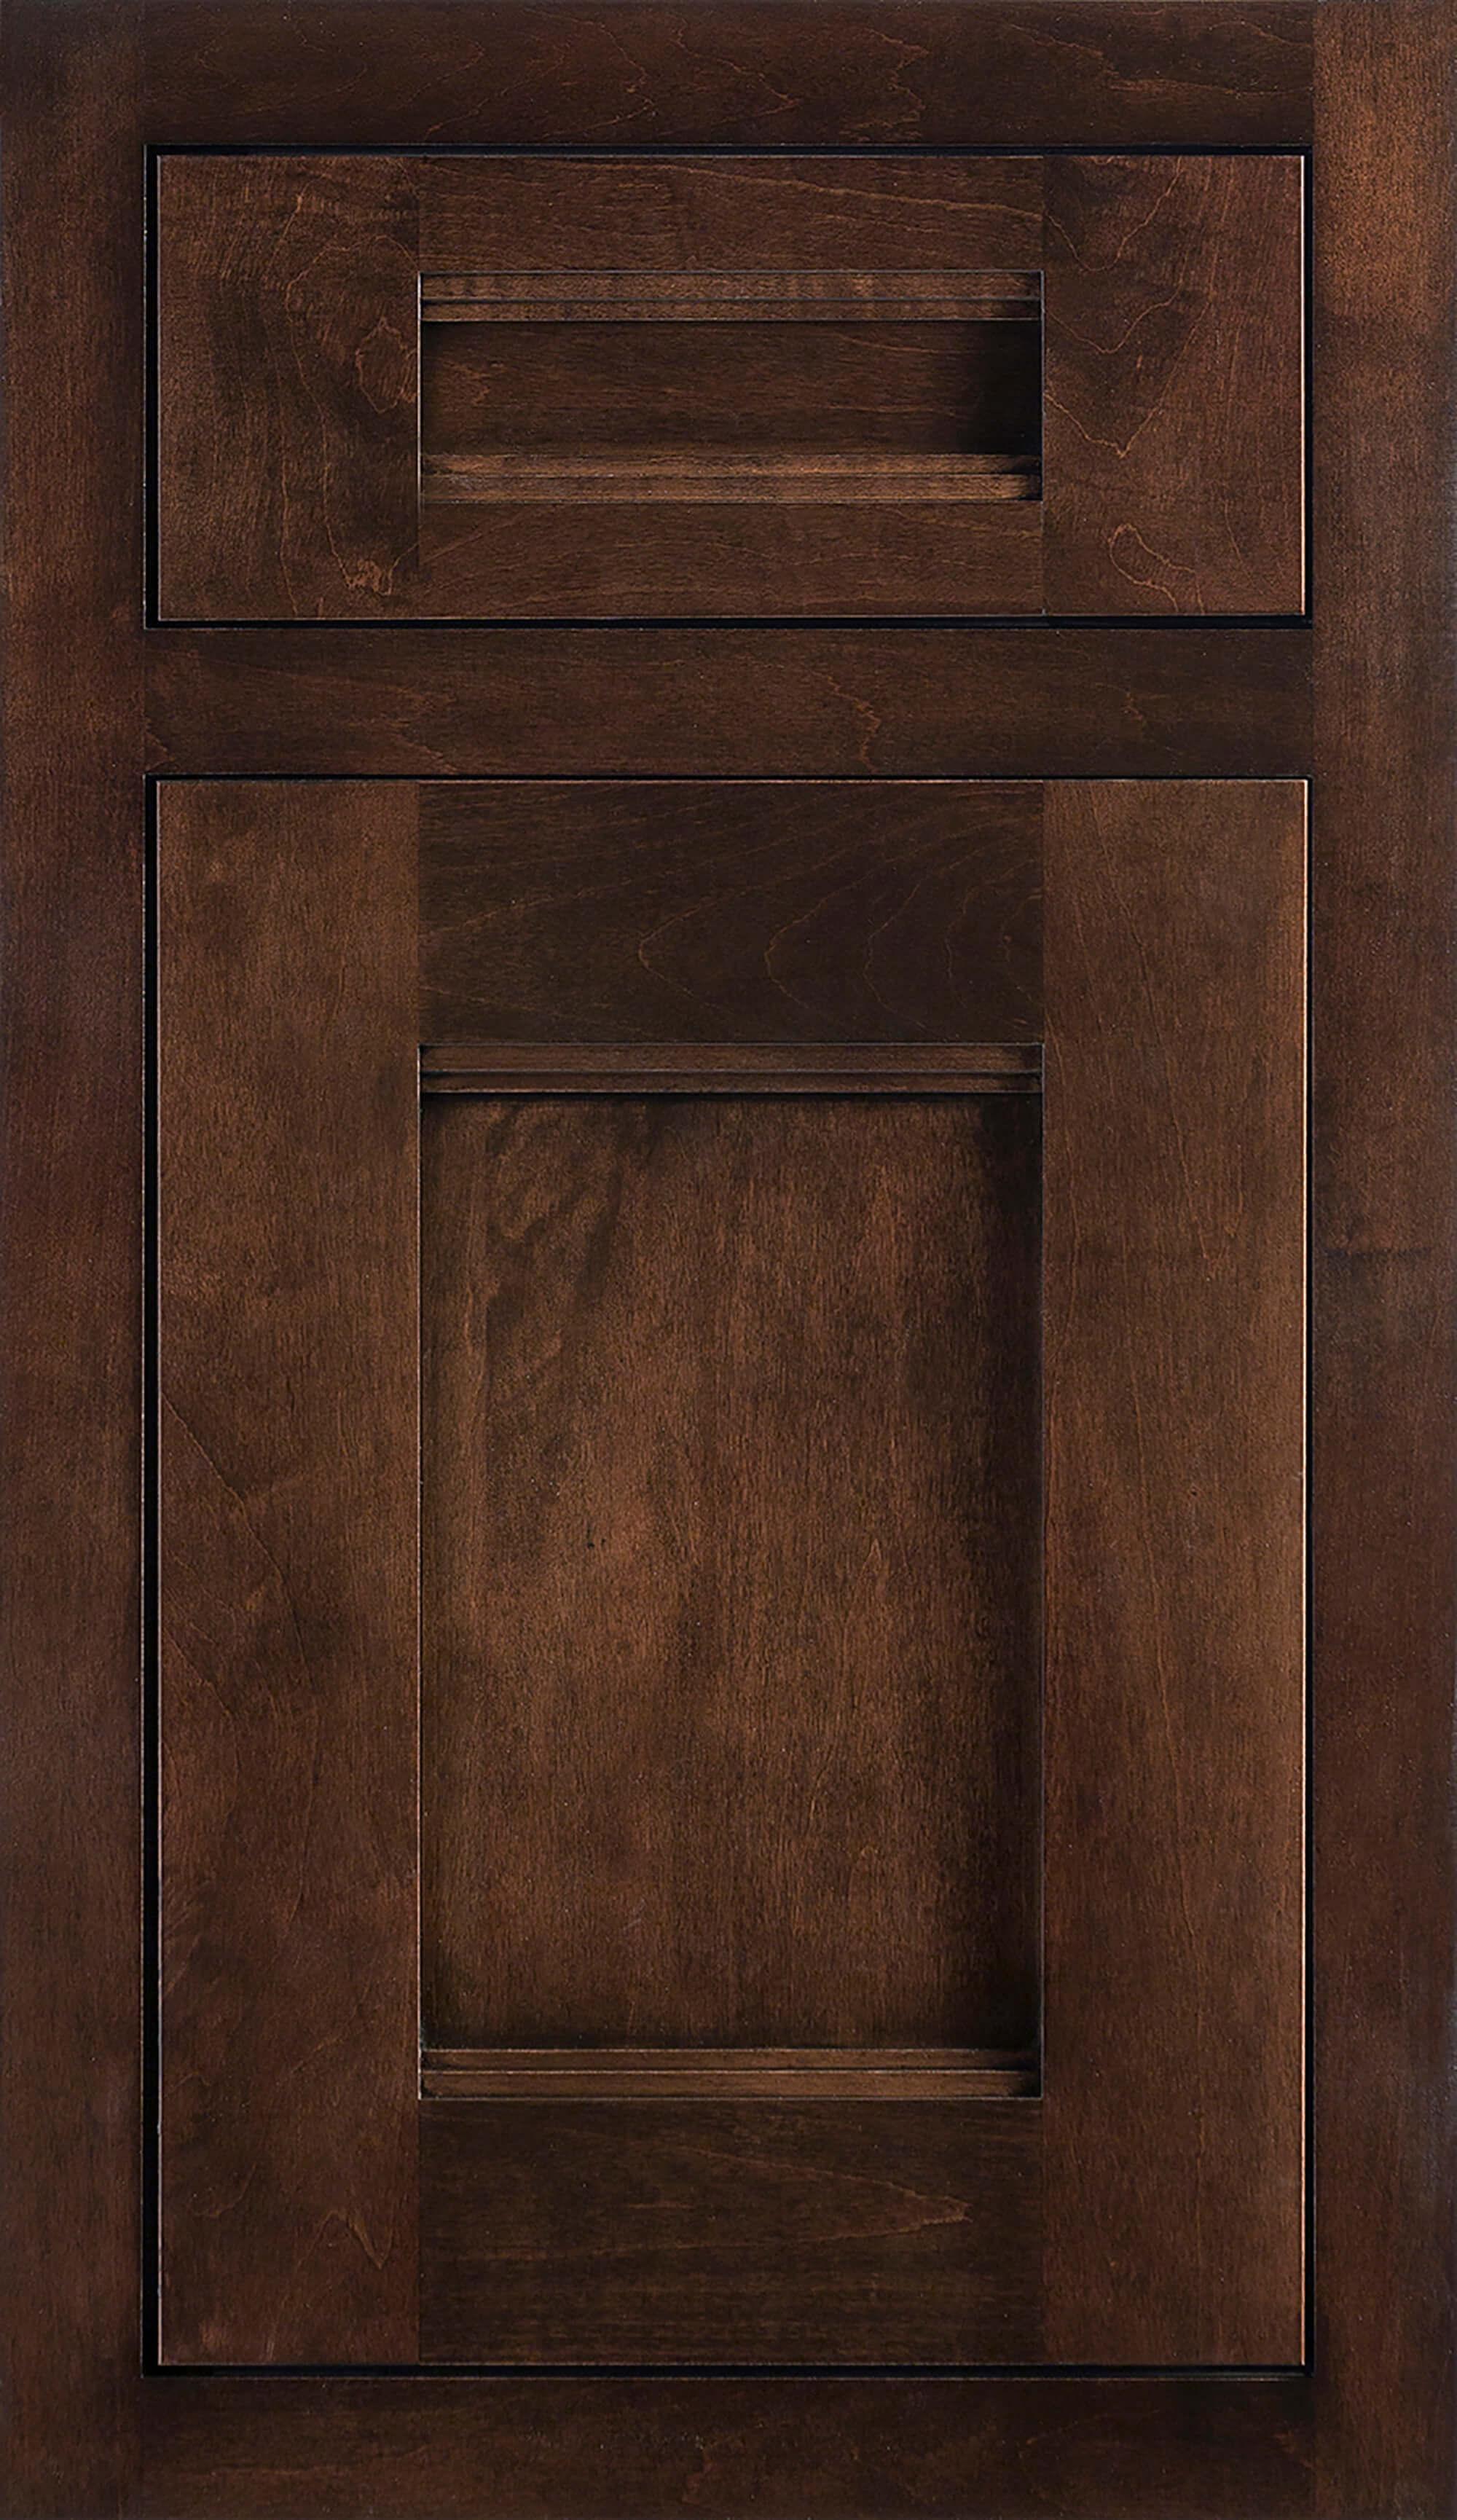 Breckenridge Panel - Inset